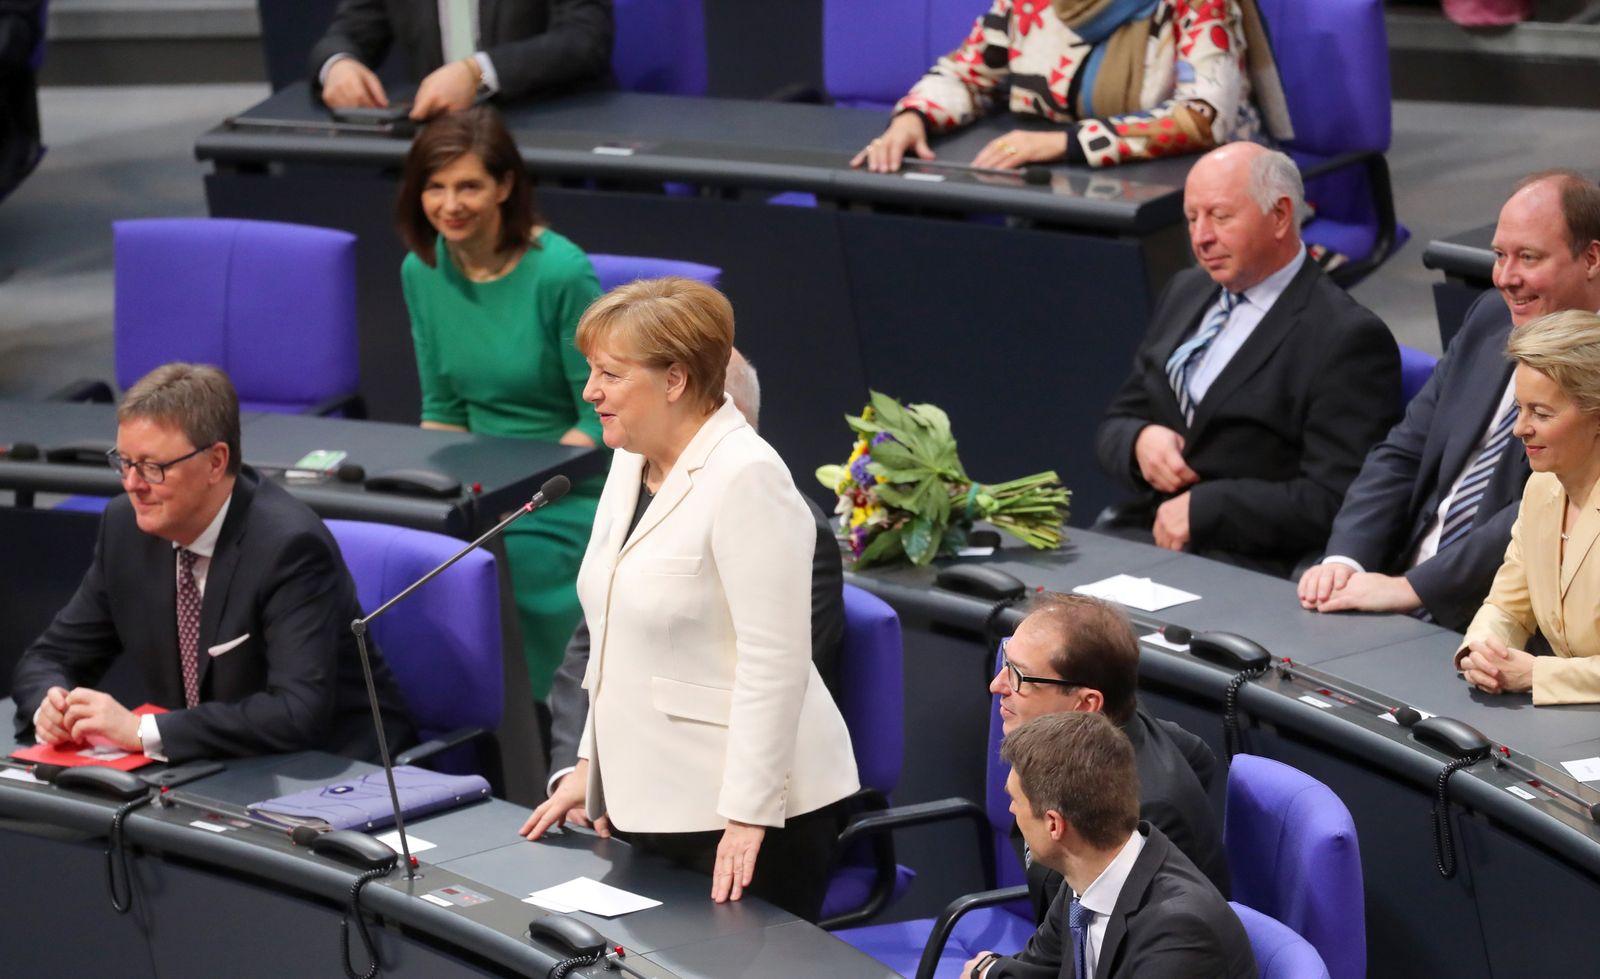 Regierungsbildung/ Merkel nimmt Wahl an